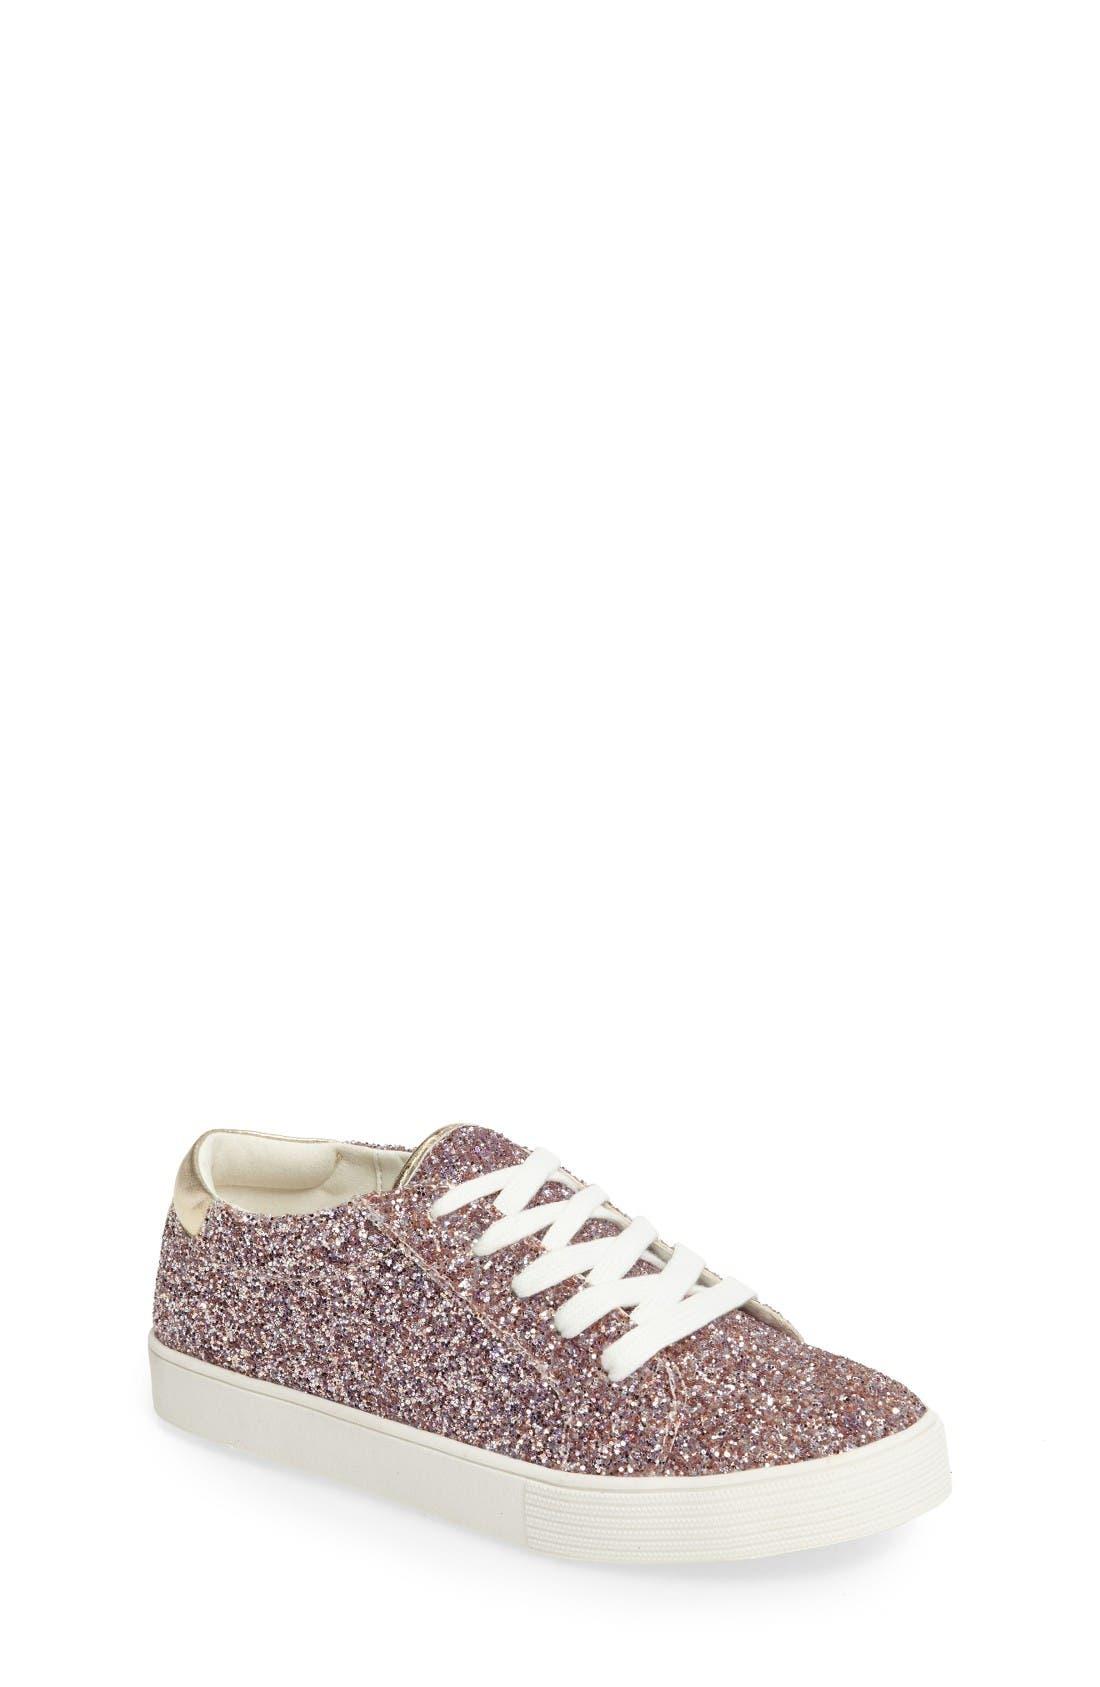 Kam Sneaker,                             Main thumbnail 1, color,                             Champagne